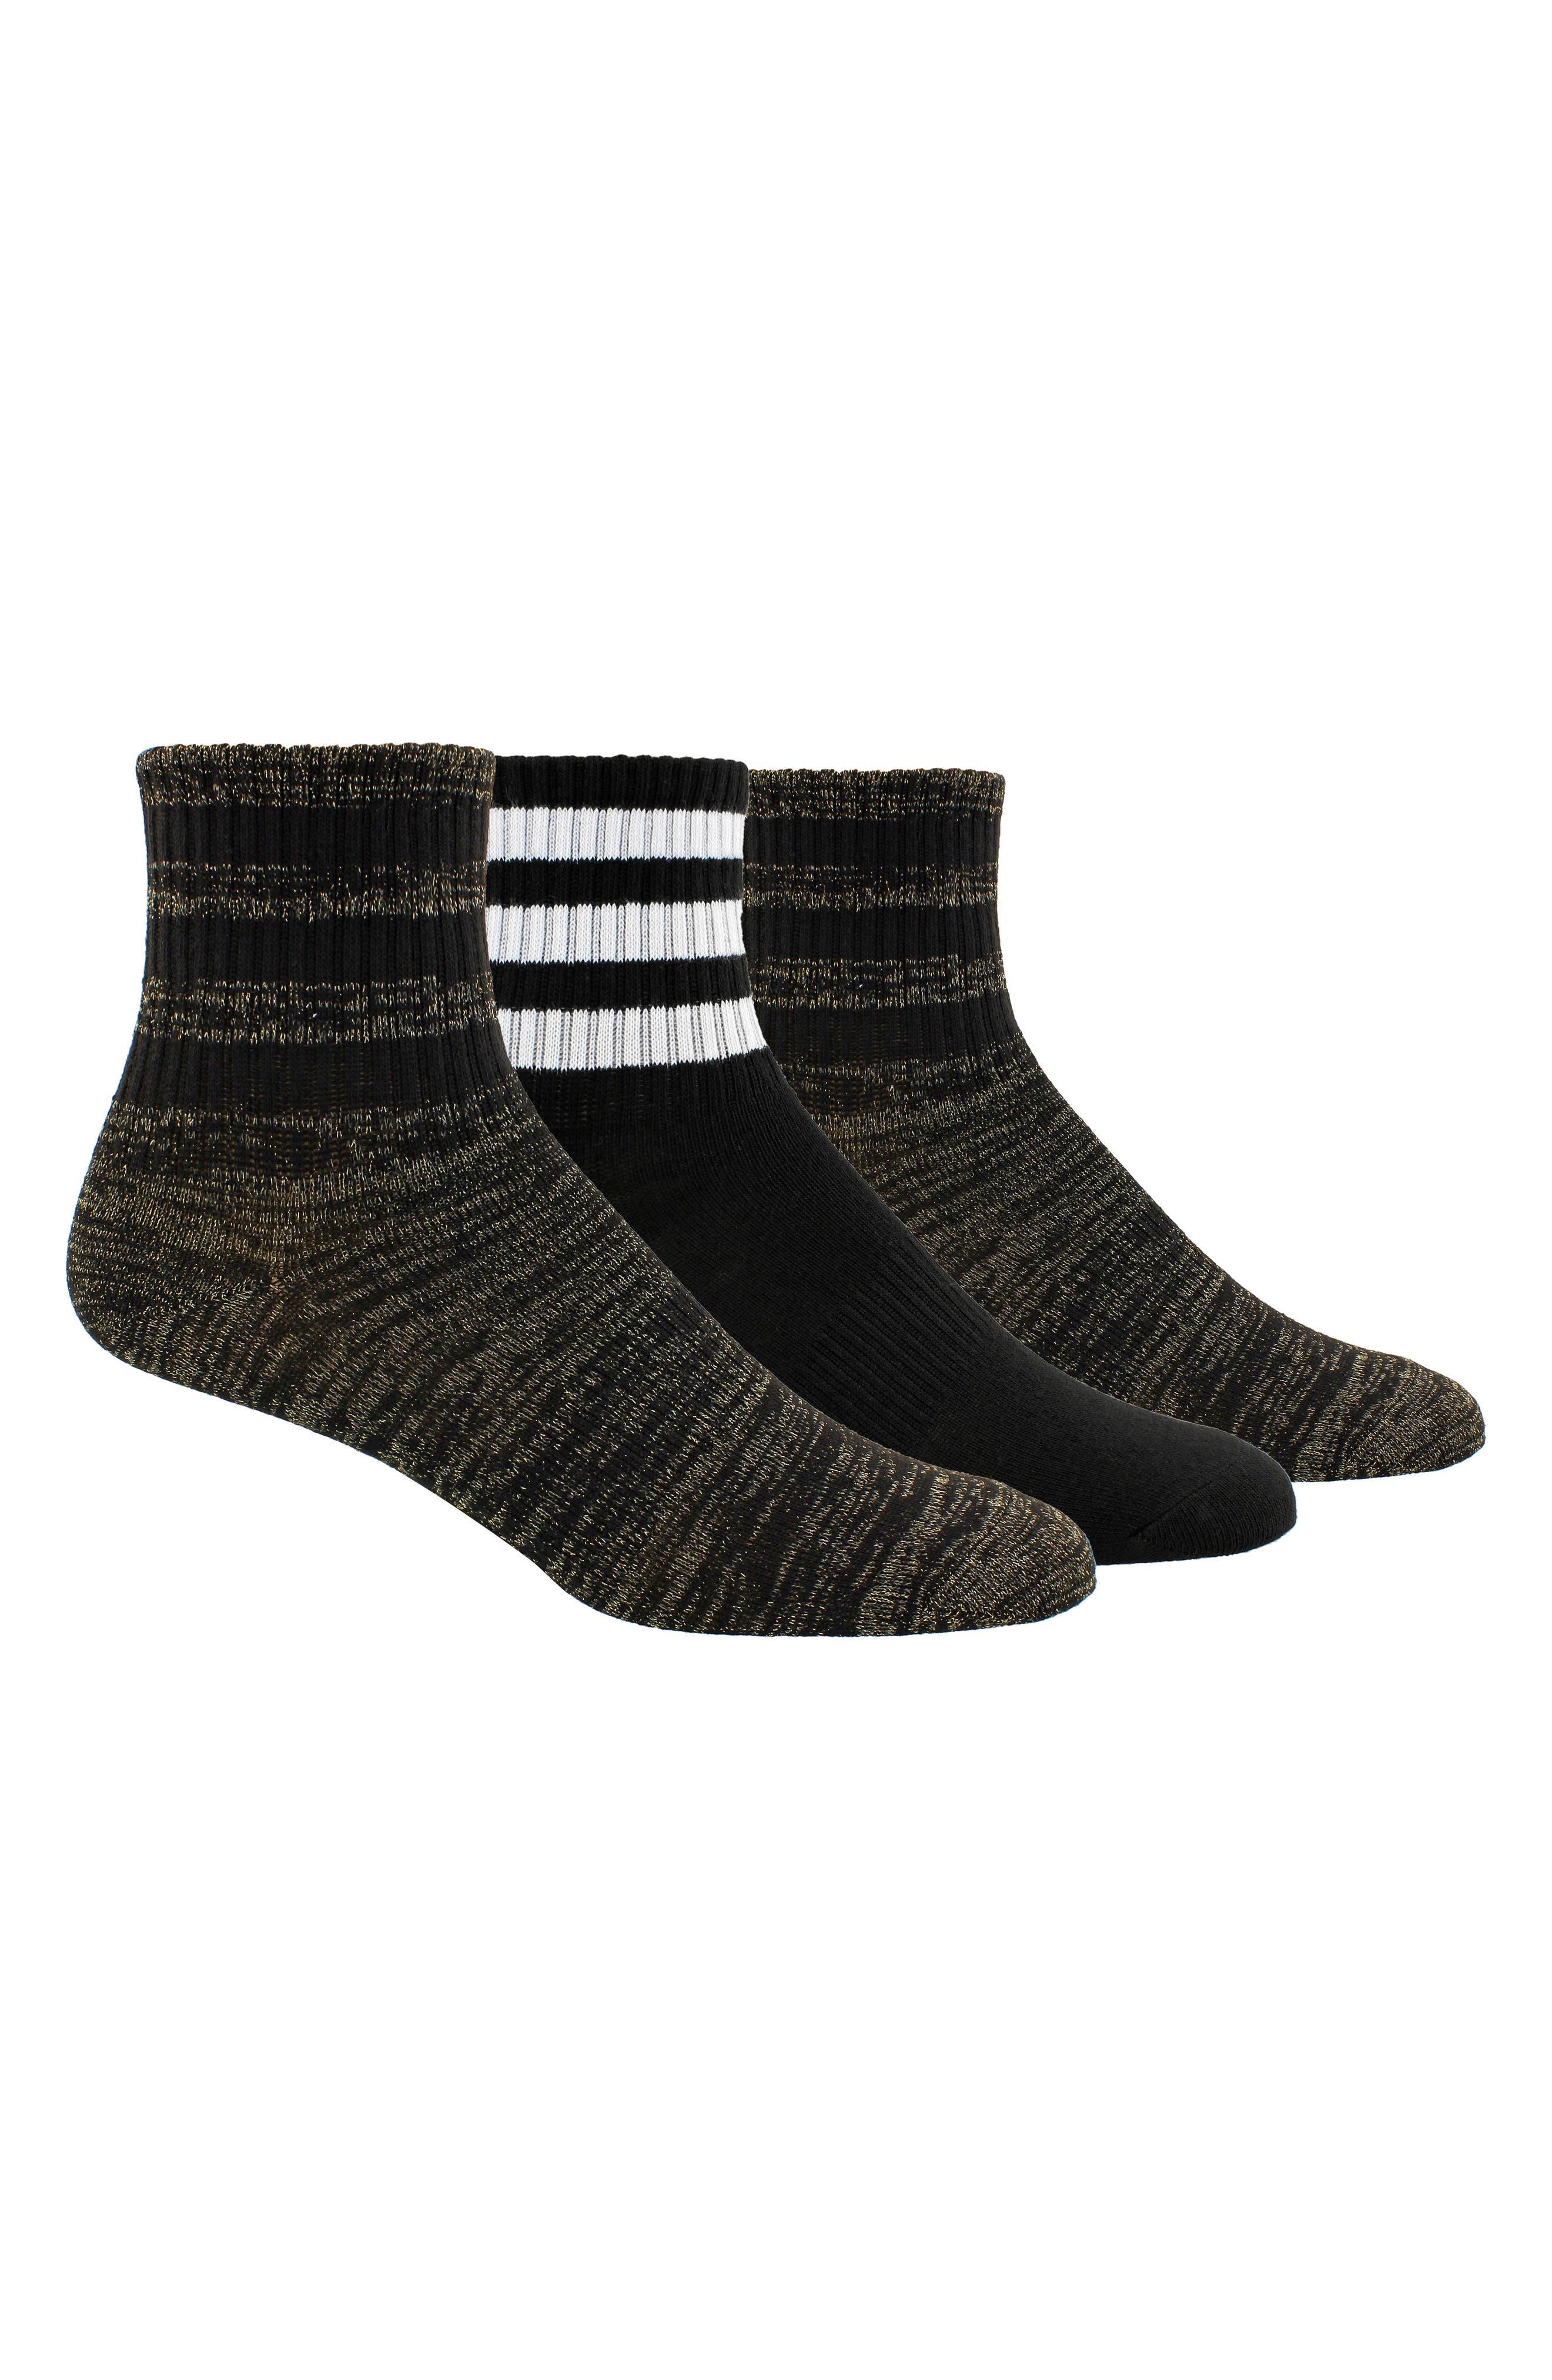 3-Stripes 3-Pack Ankle Socks,                             Main thumbnail 1, color,                             001